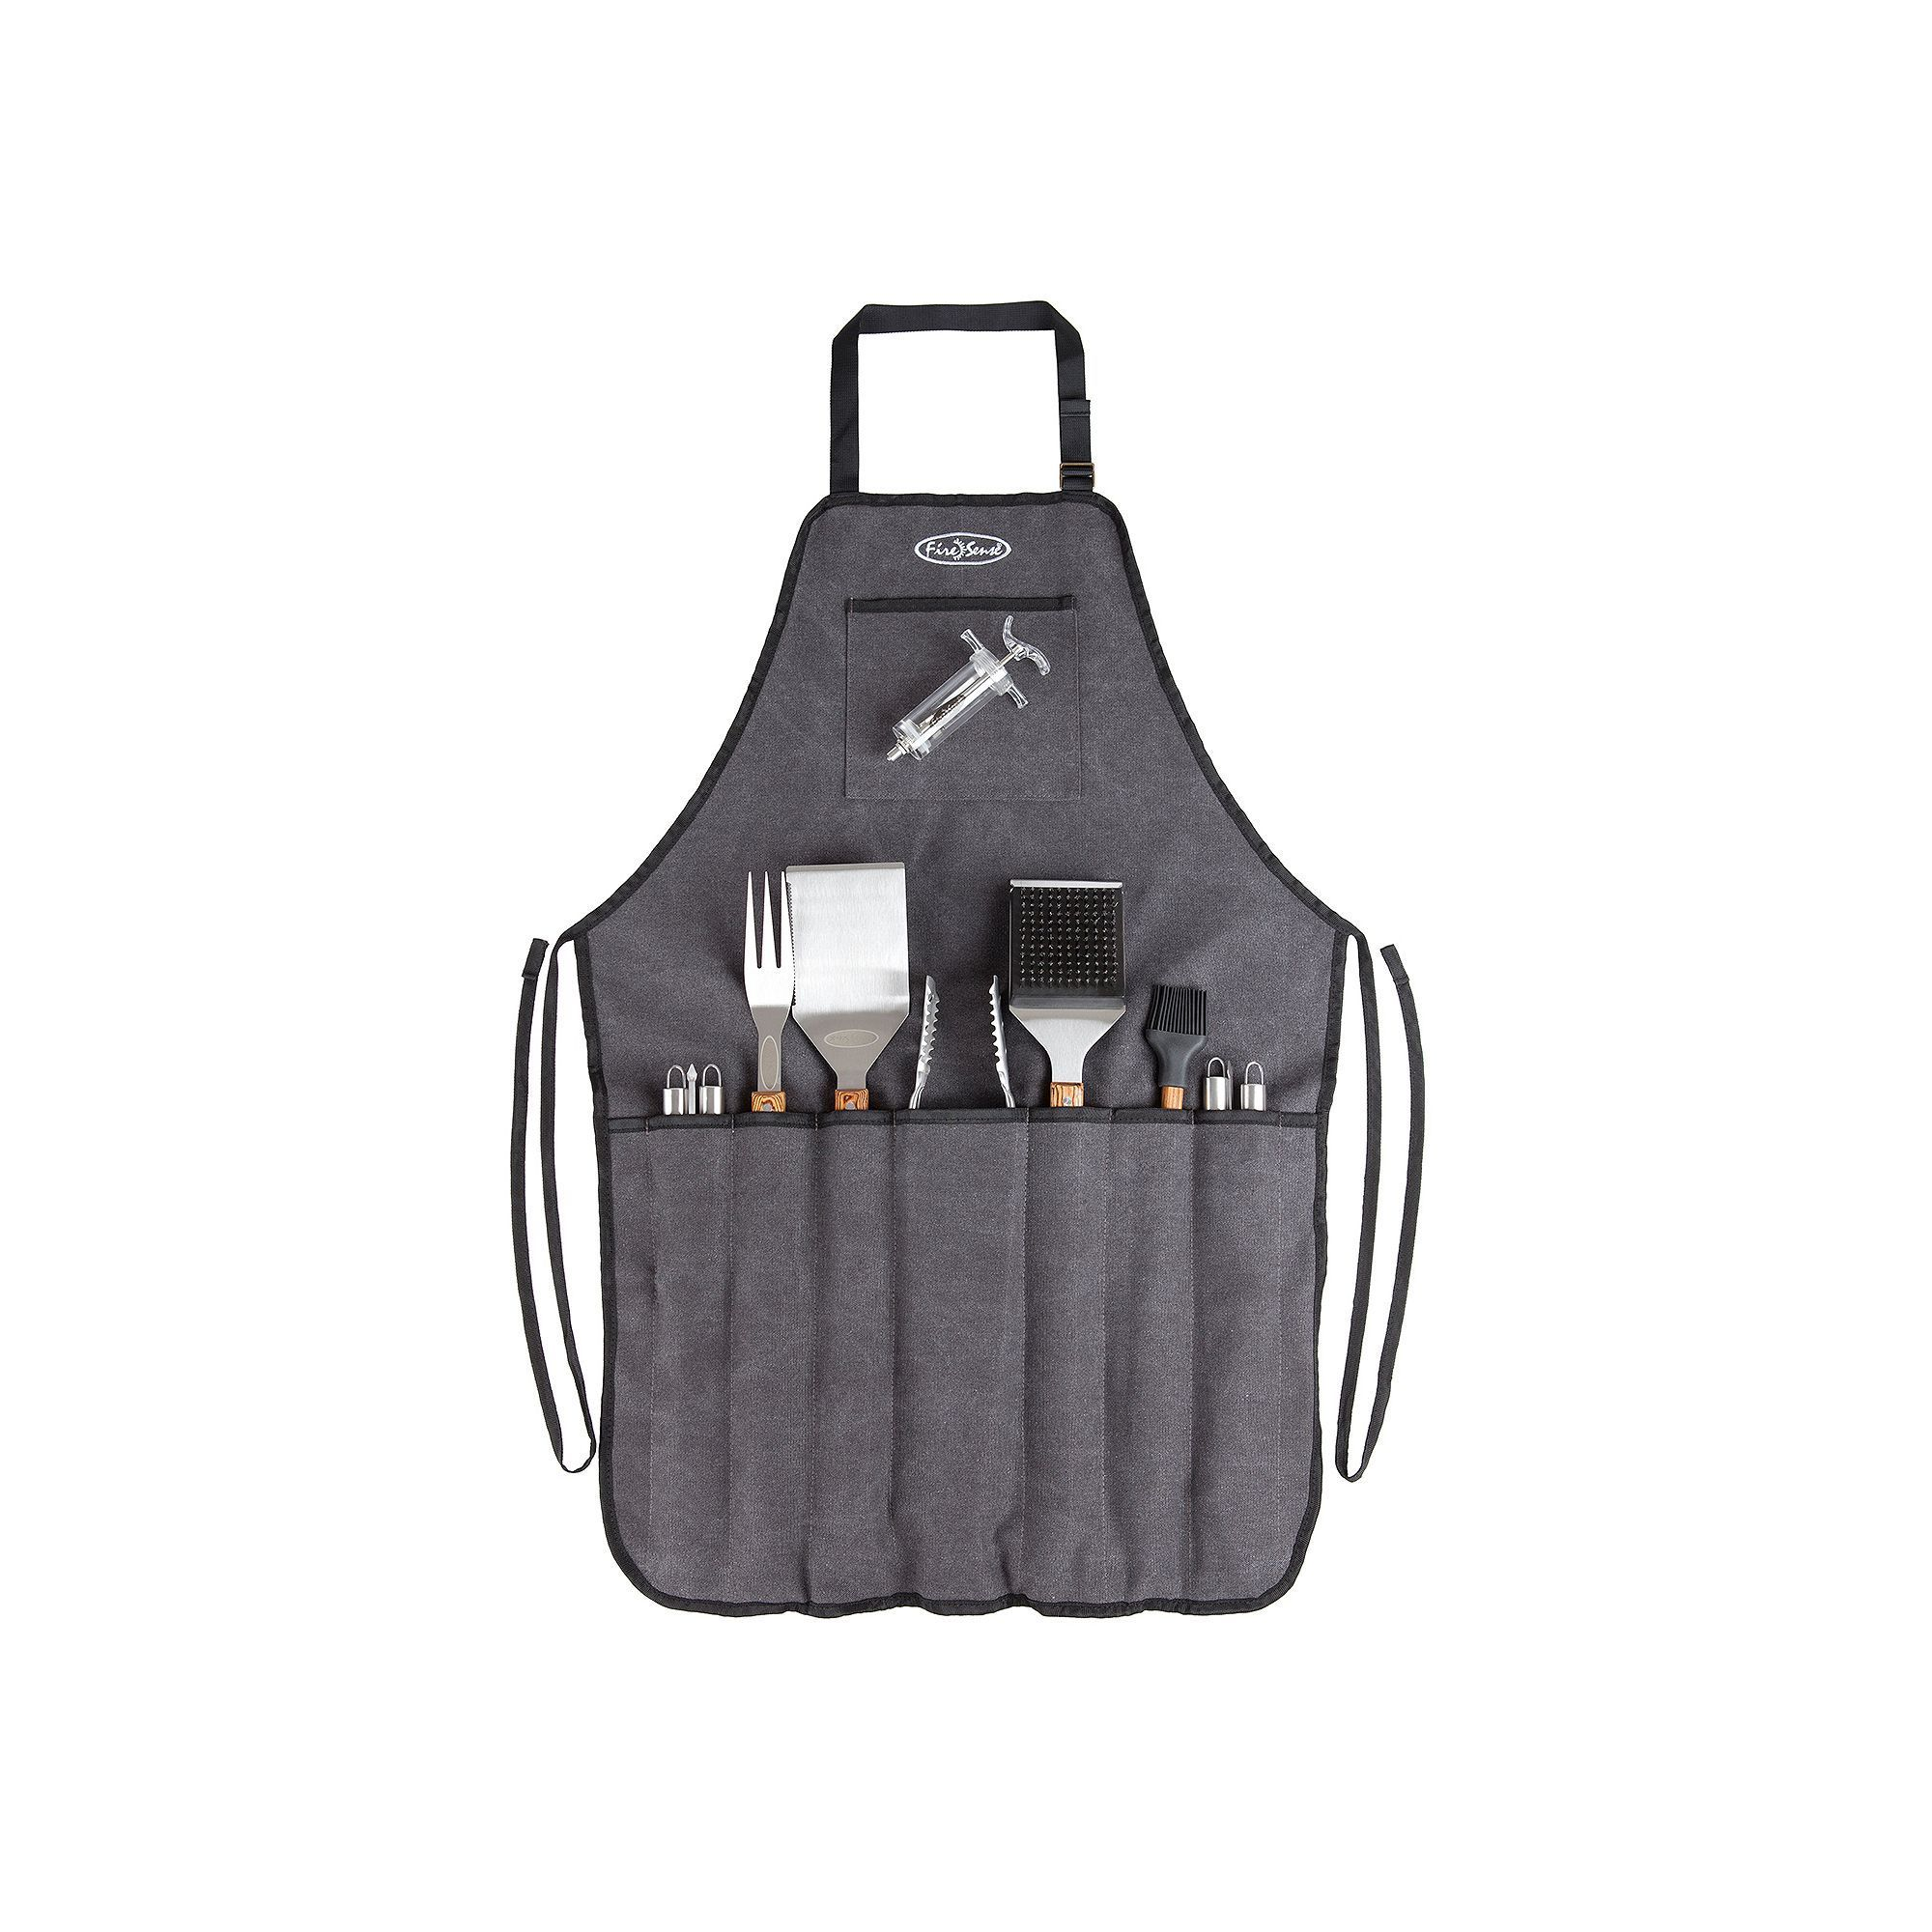 Fire Sense Elite Stainless Steel BBQ Tool & Apron Set Silver